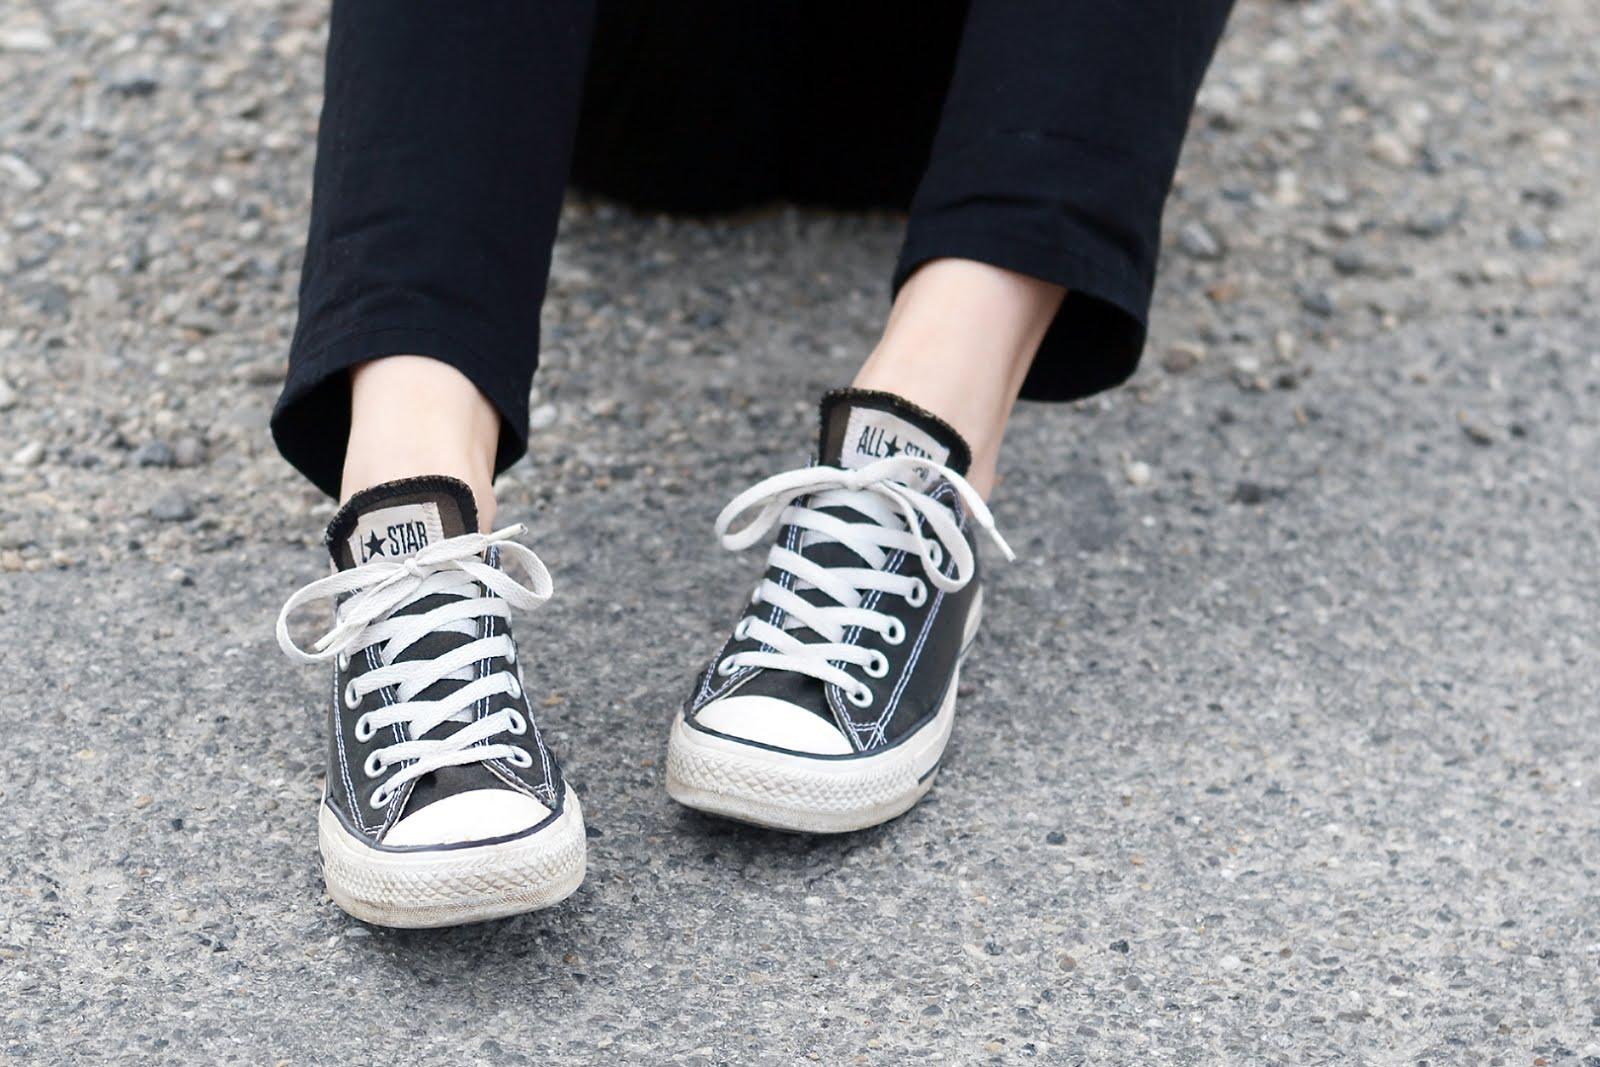 Crochet long sleeve top, moth clothing, asos dungarees, all black, grey hair, mode blogger, belgie, street style